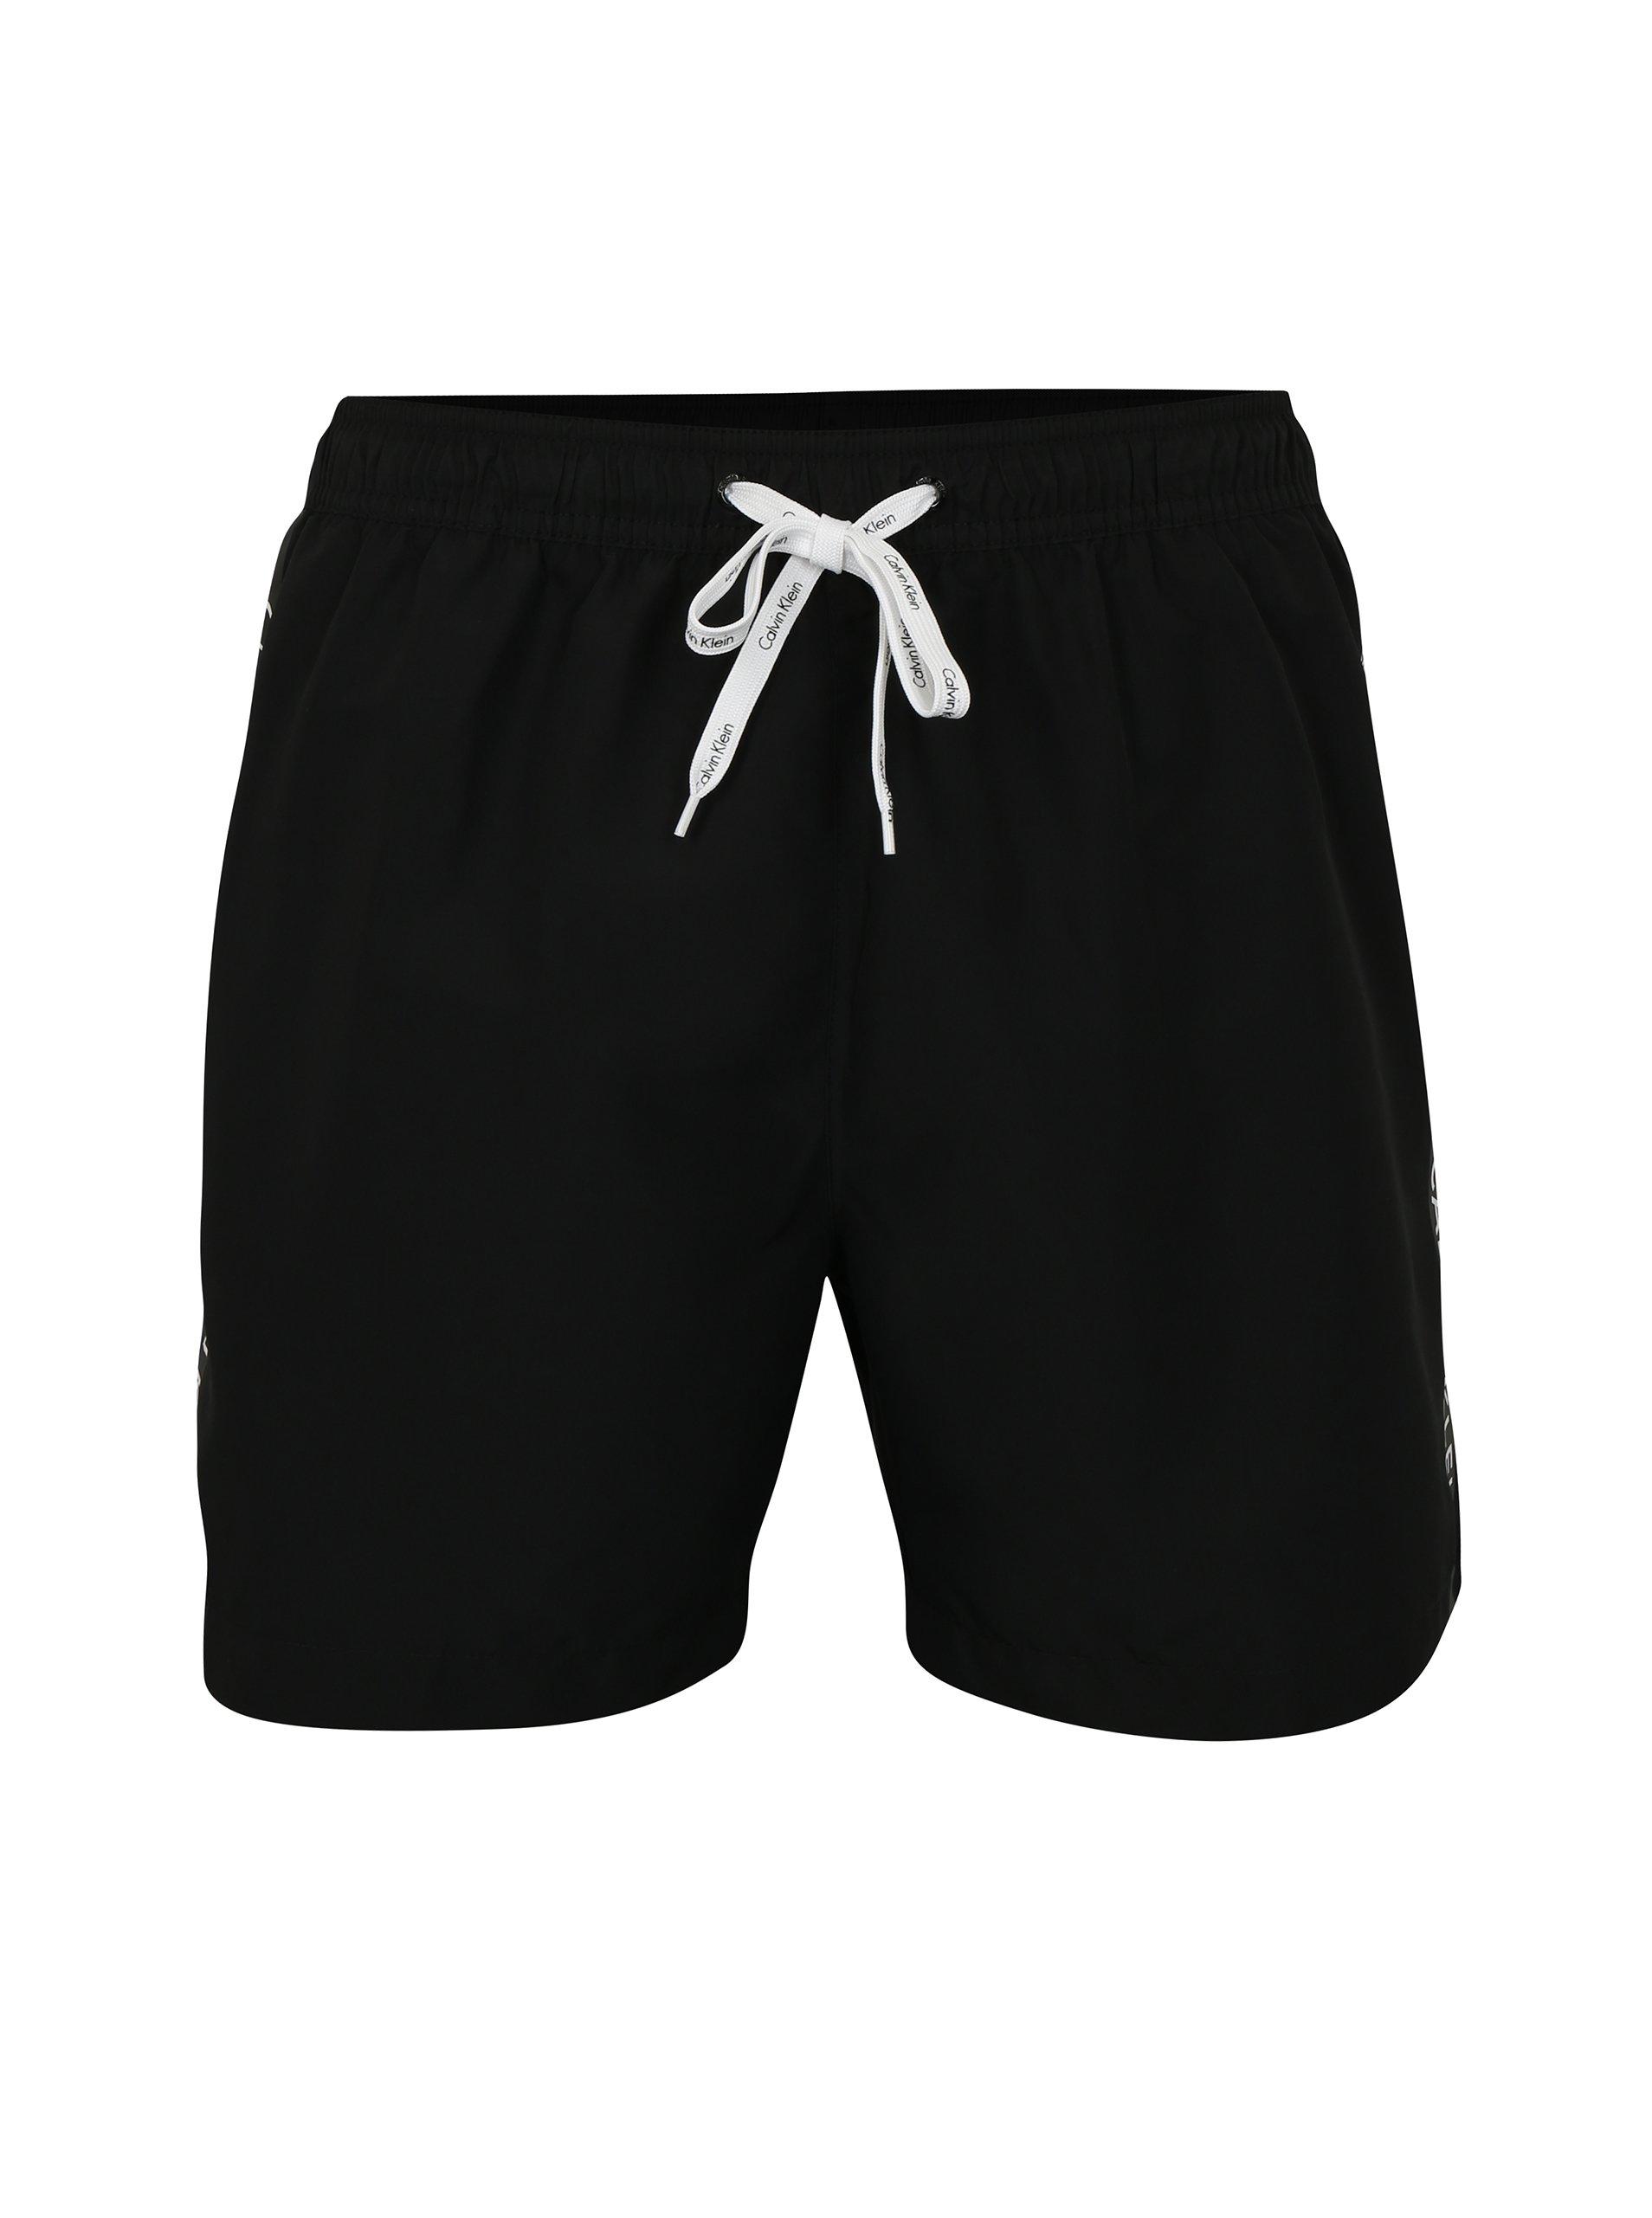 d92c544f4f30 Čierne pánske plavky Calvin Klein